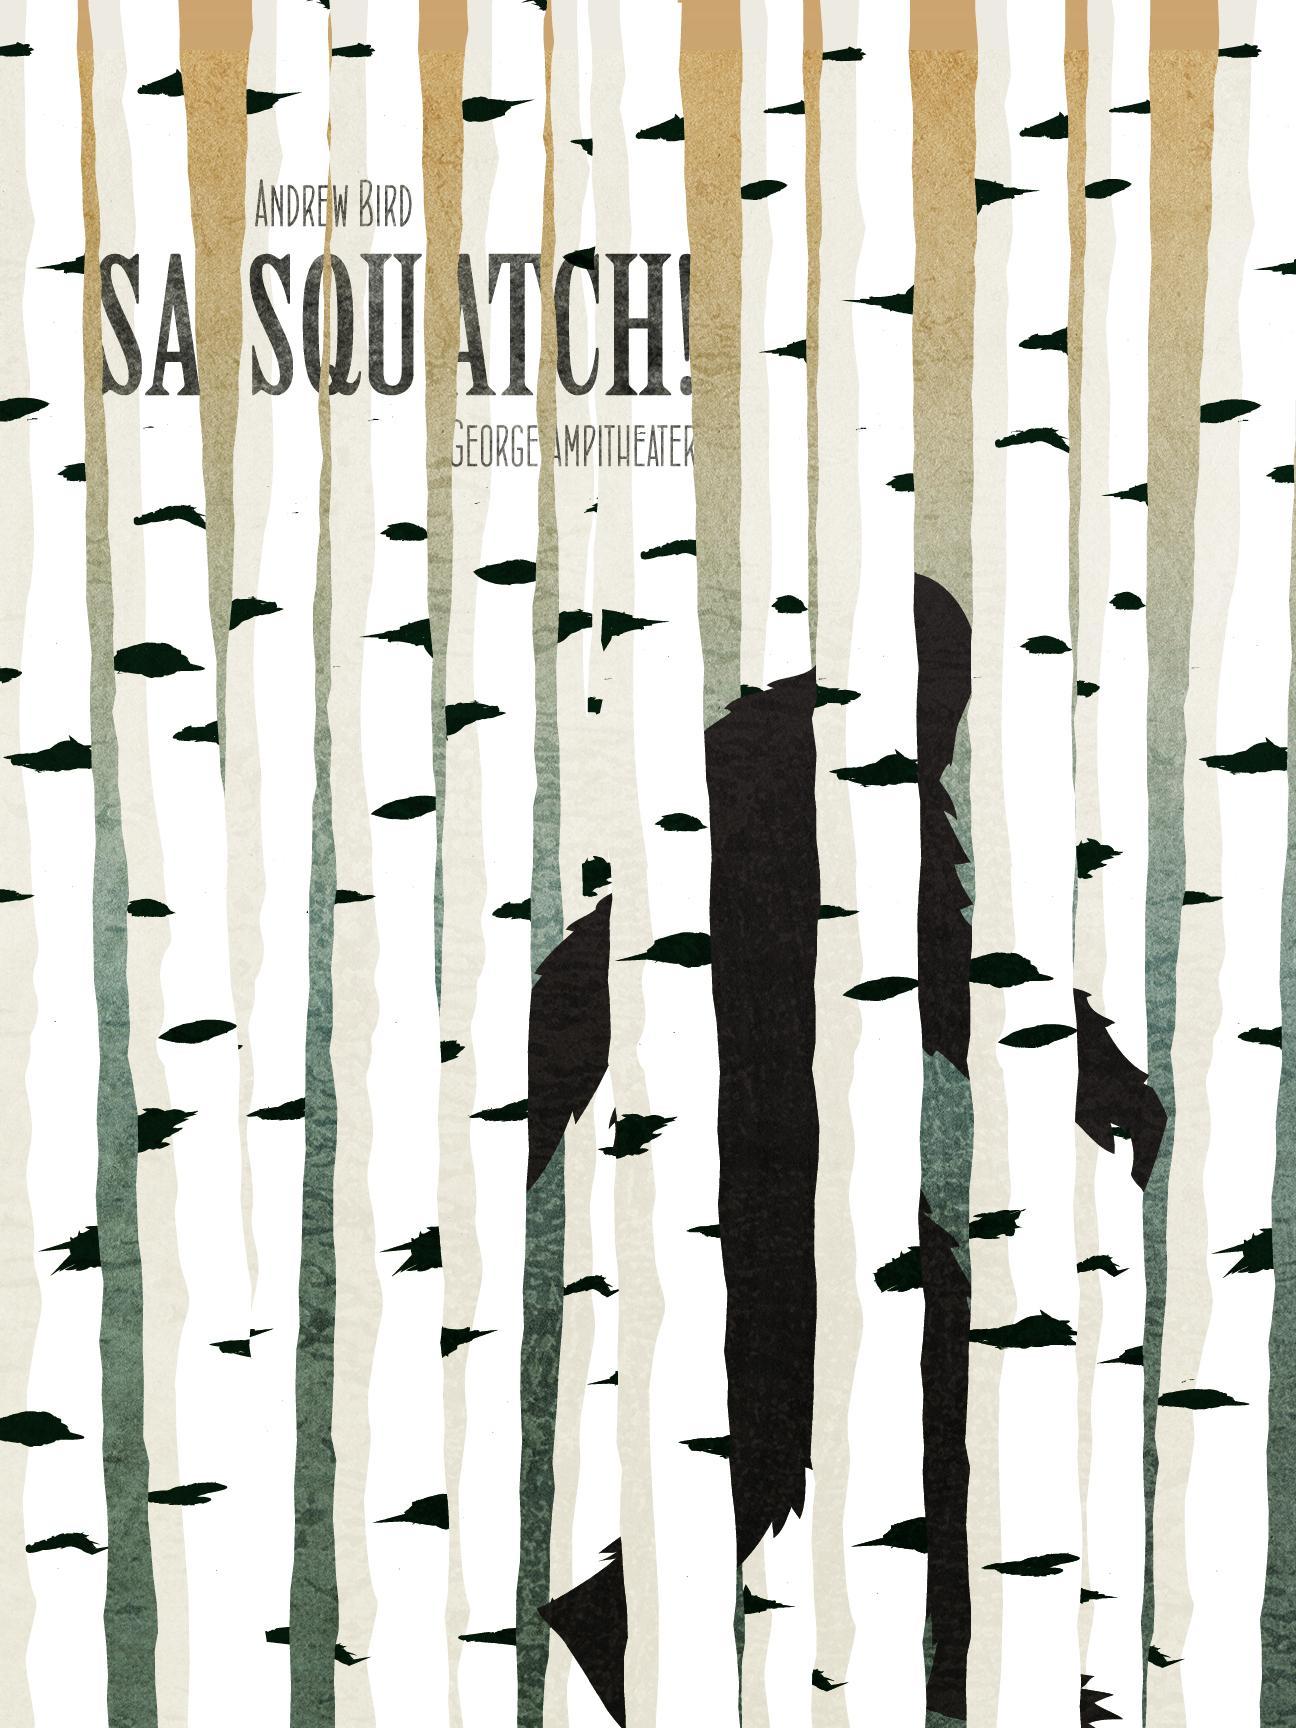 Andrew Bird - Sasquatch Festival - image 6 - student project